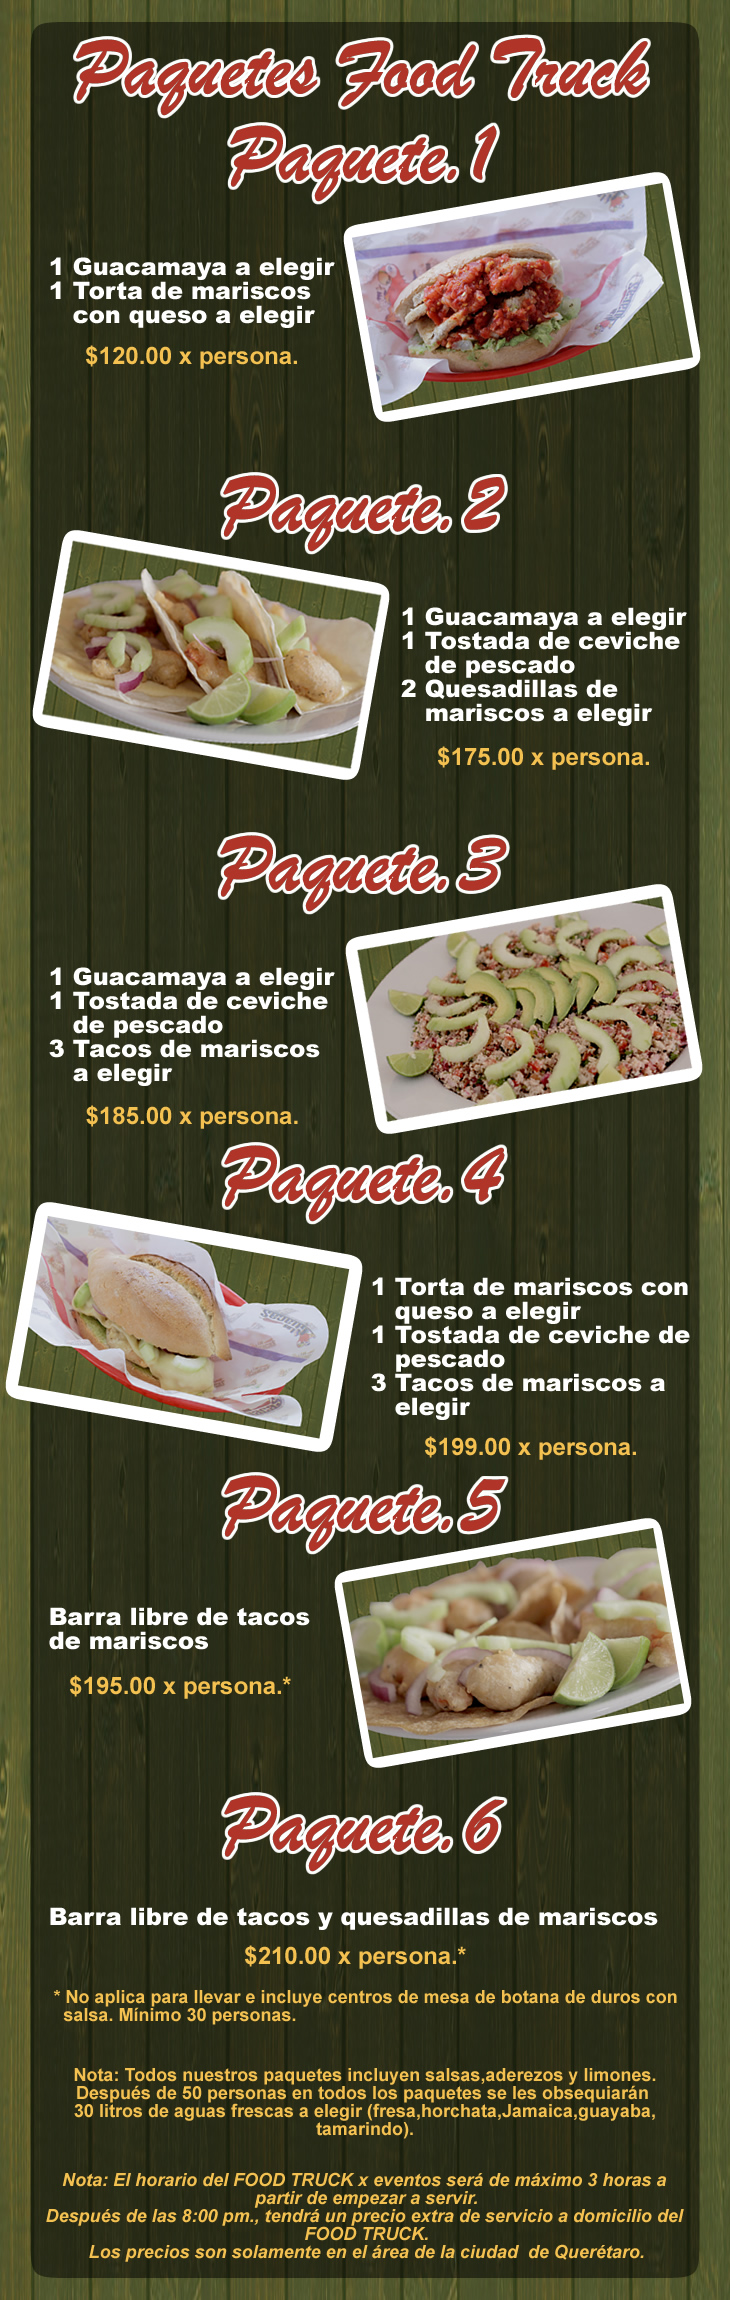 menu_food_truck